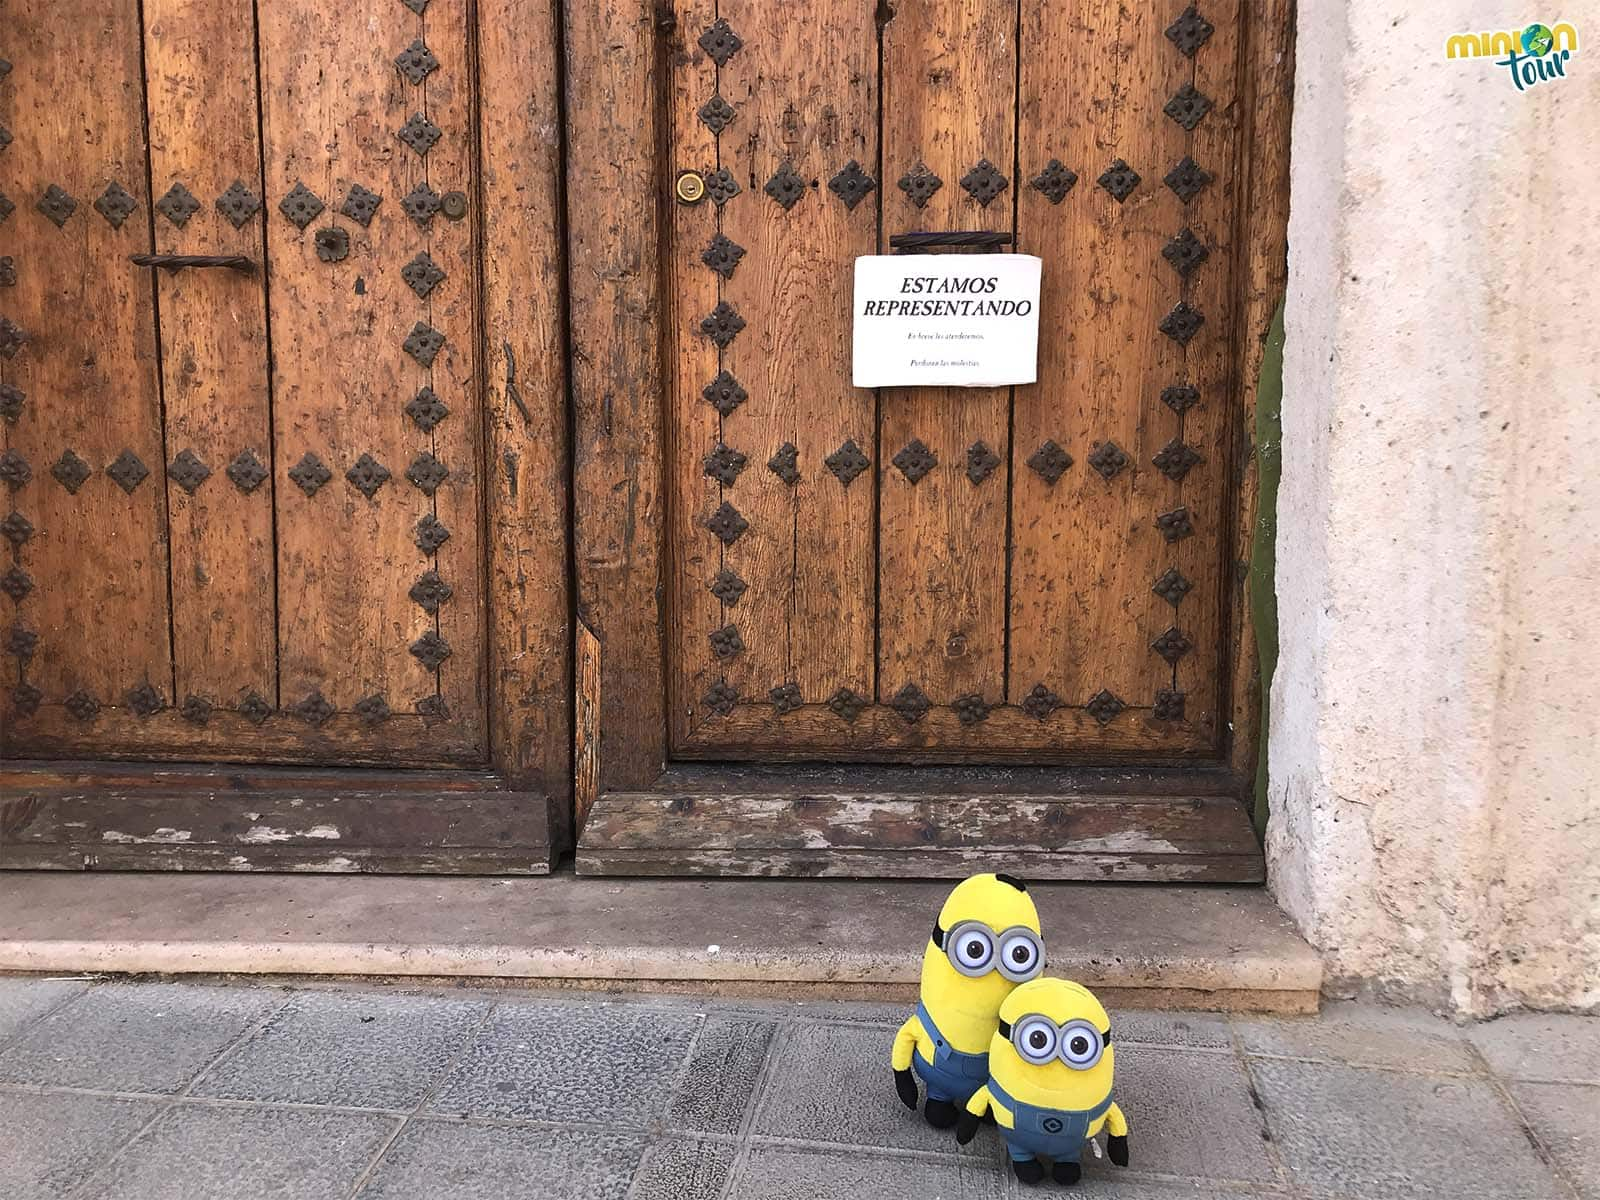 2 Minions acaban de llegar al Festival de Teatro Clásico de Almagro